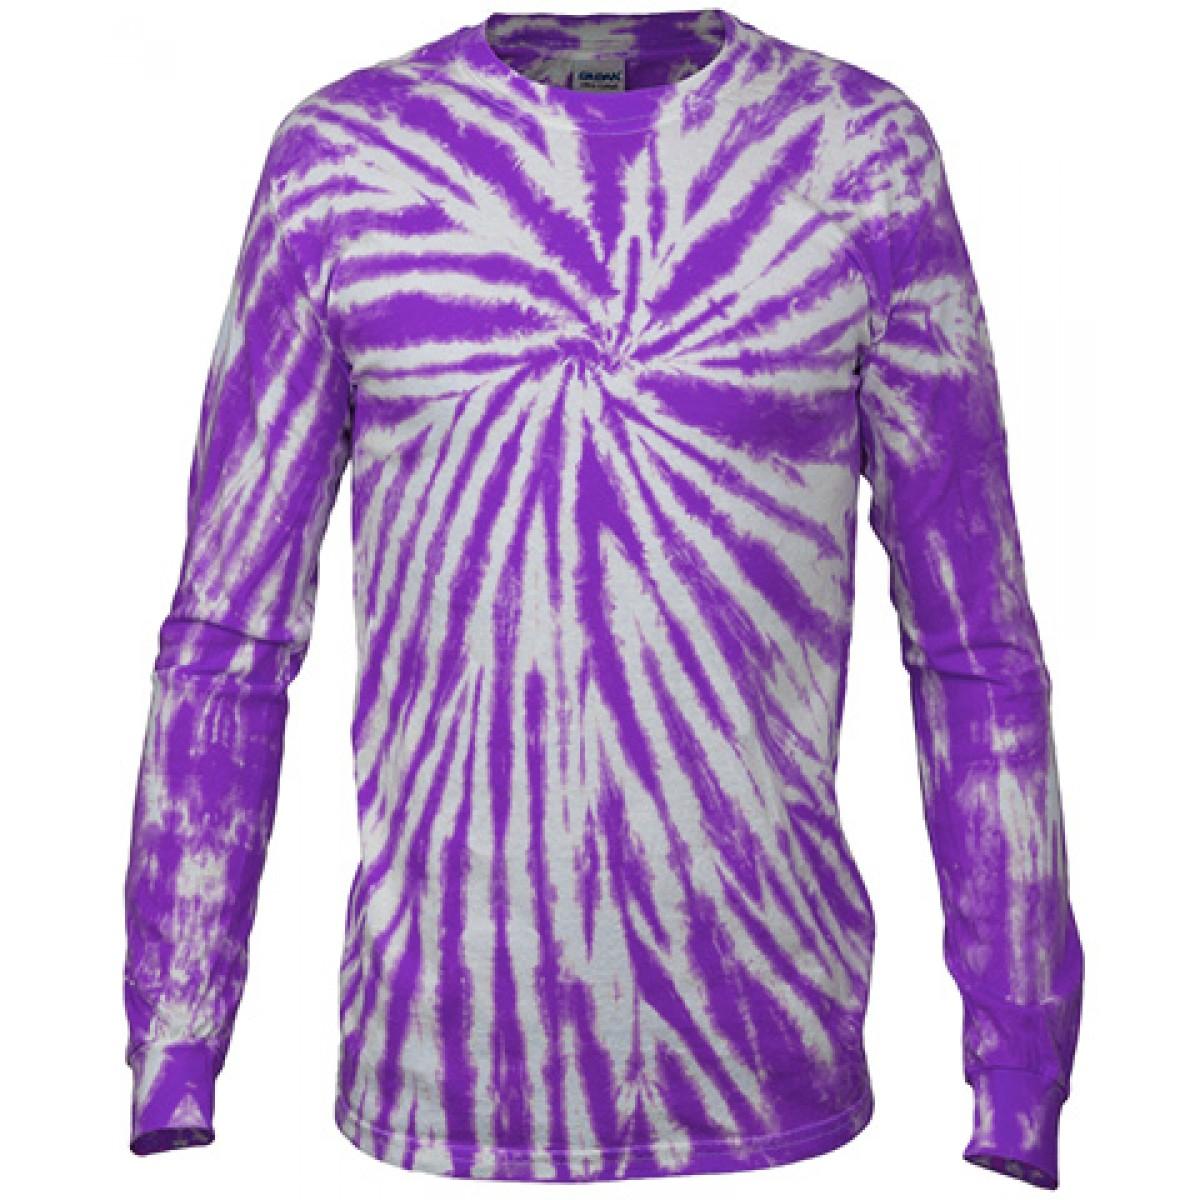 Multi Color Tie-Dye Long Sleeve Shirt -Fuscia-L